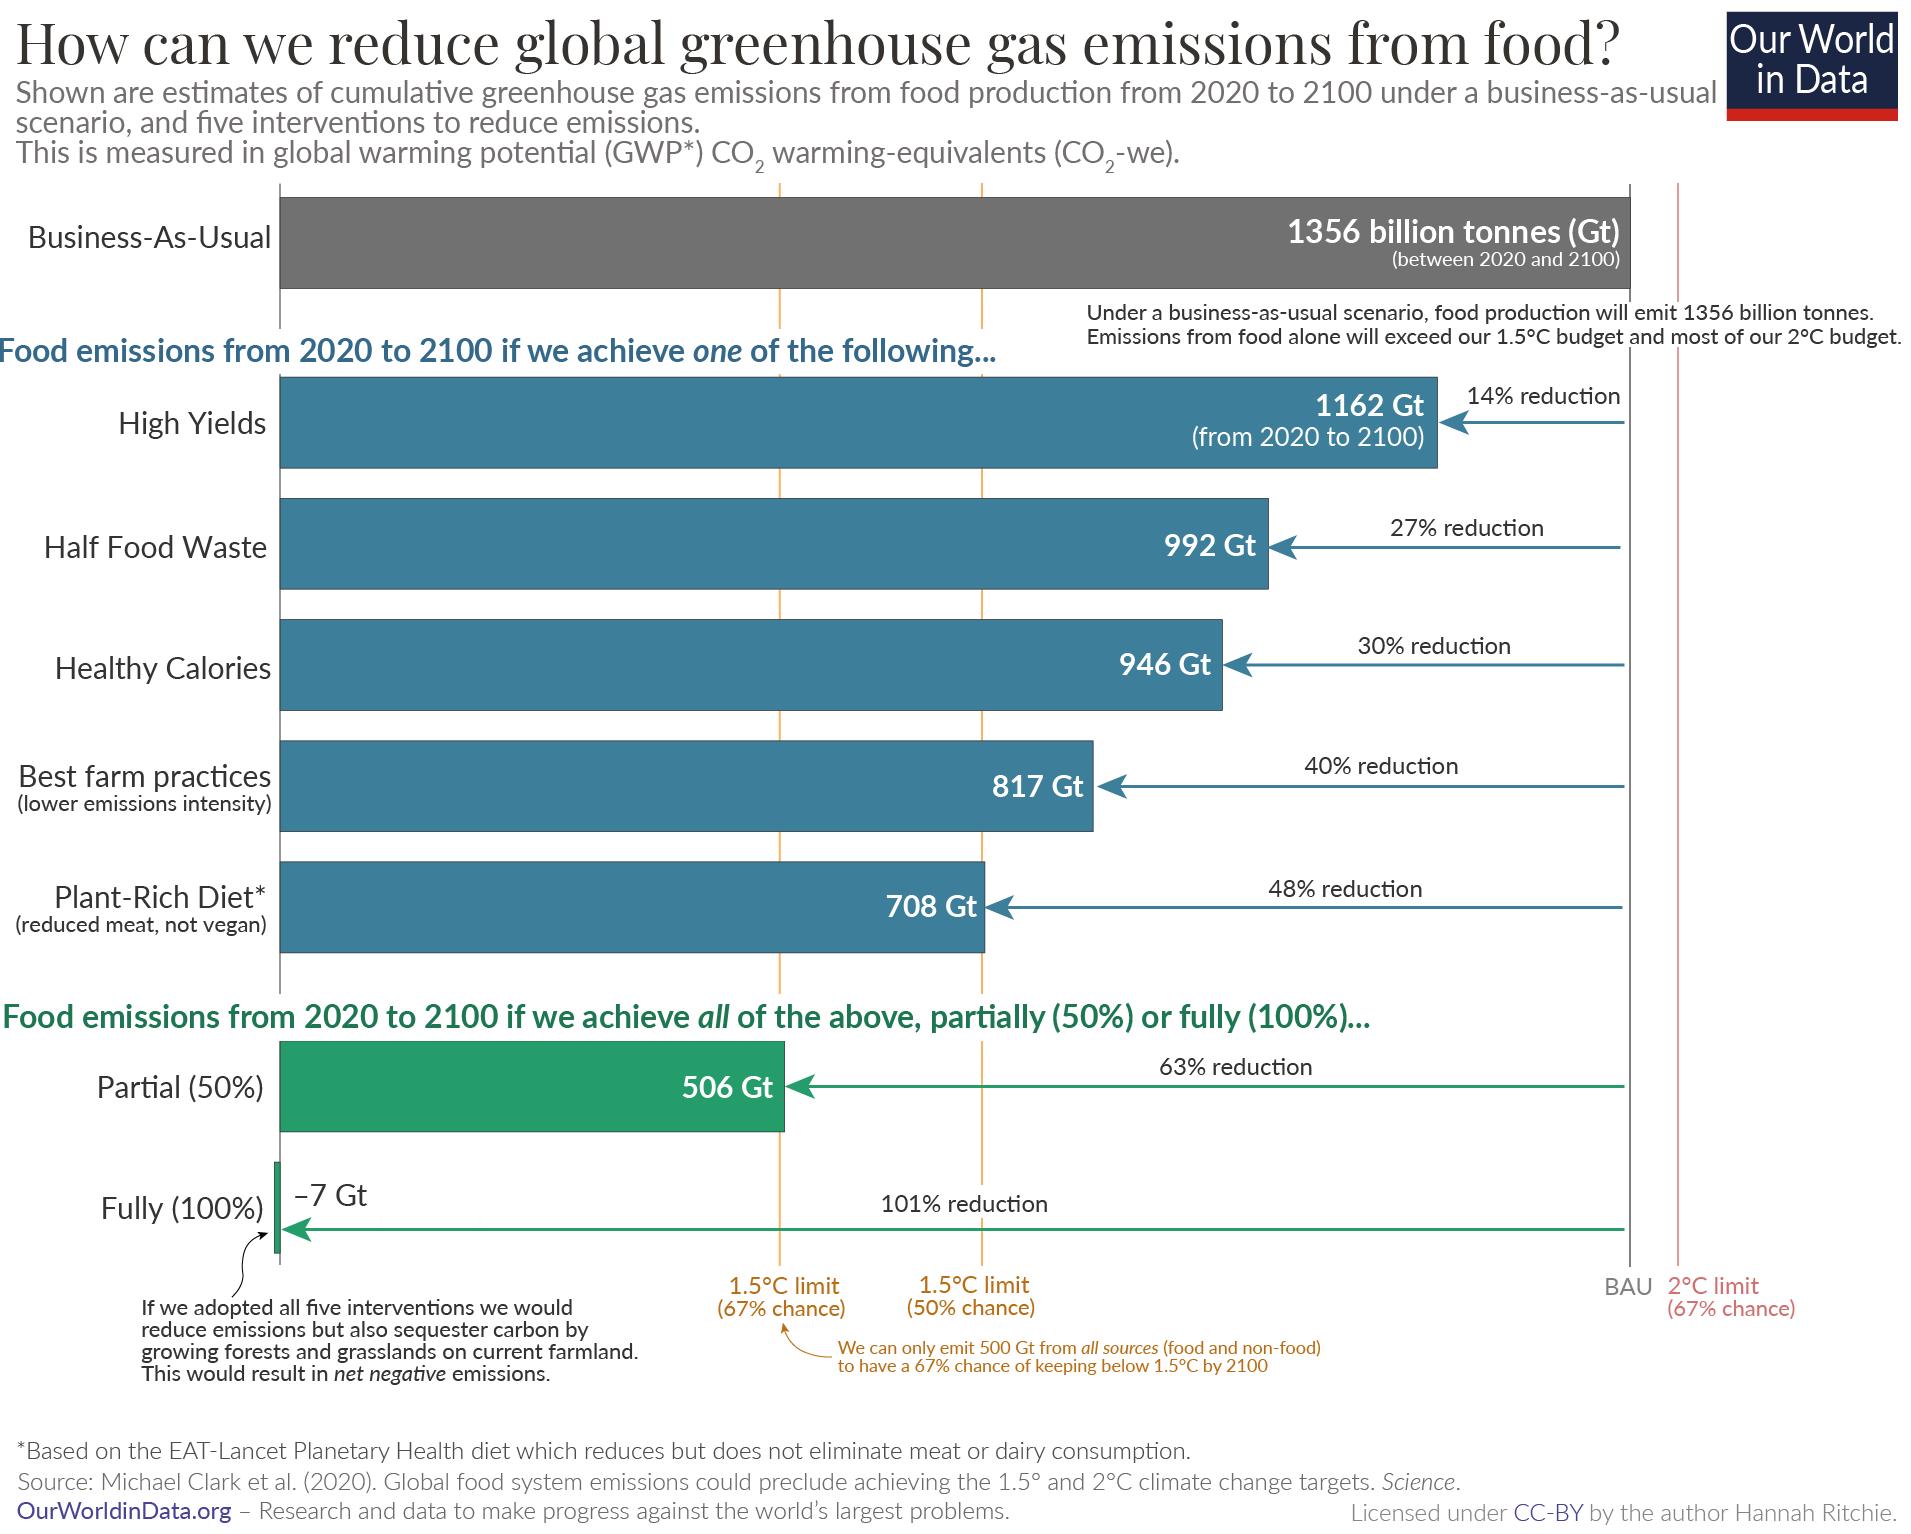 Food emissions by reduction scenario clark et al.